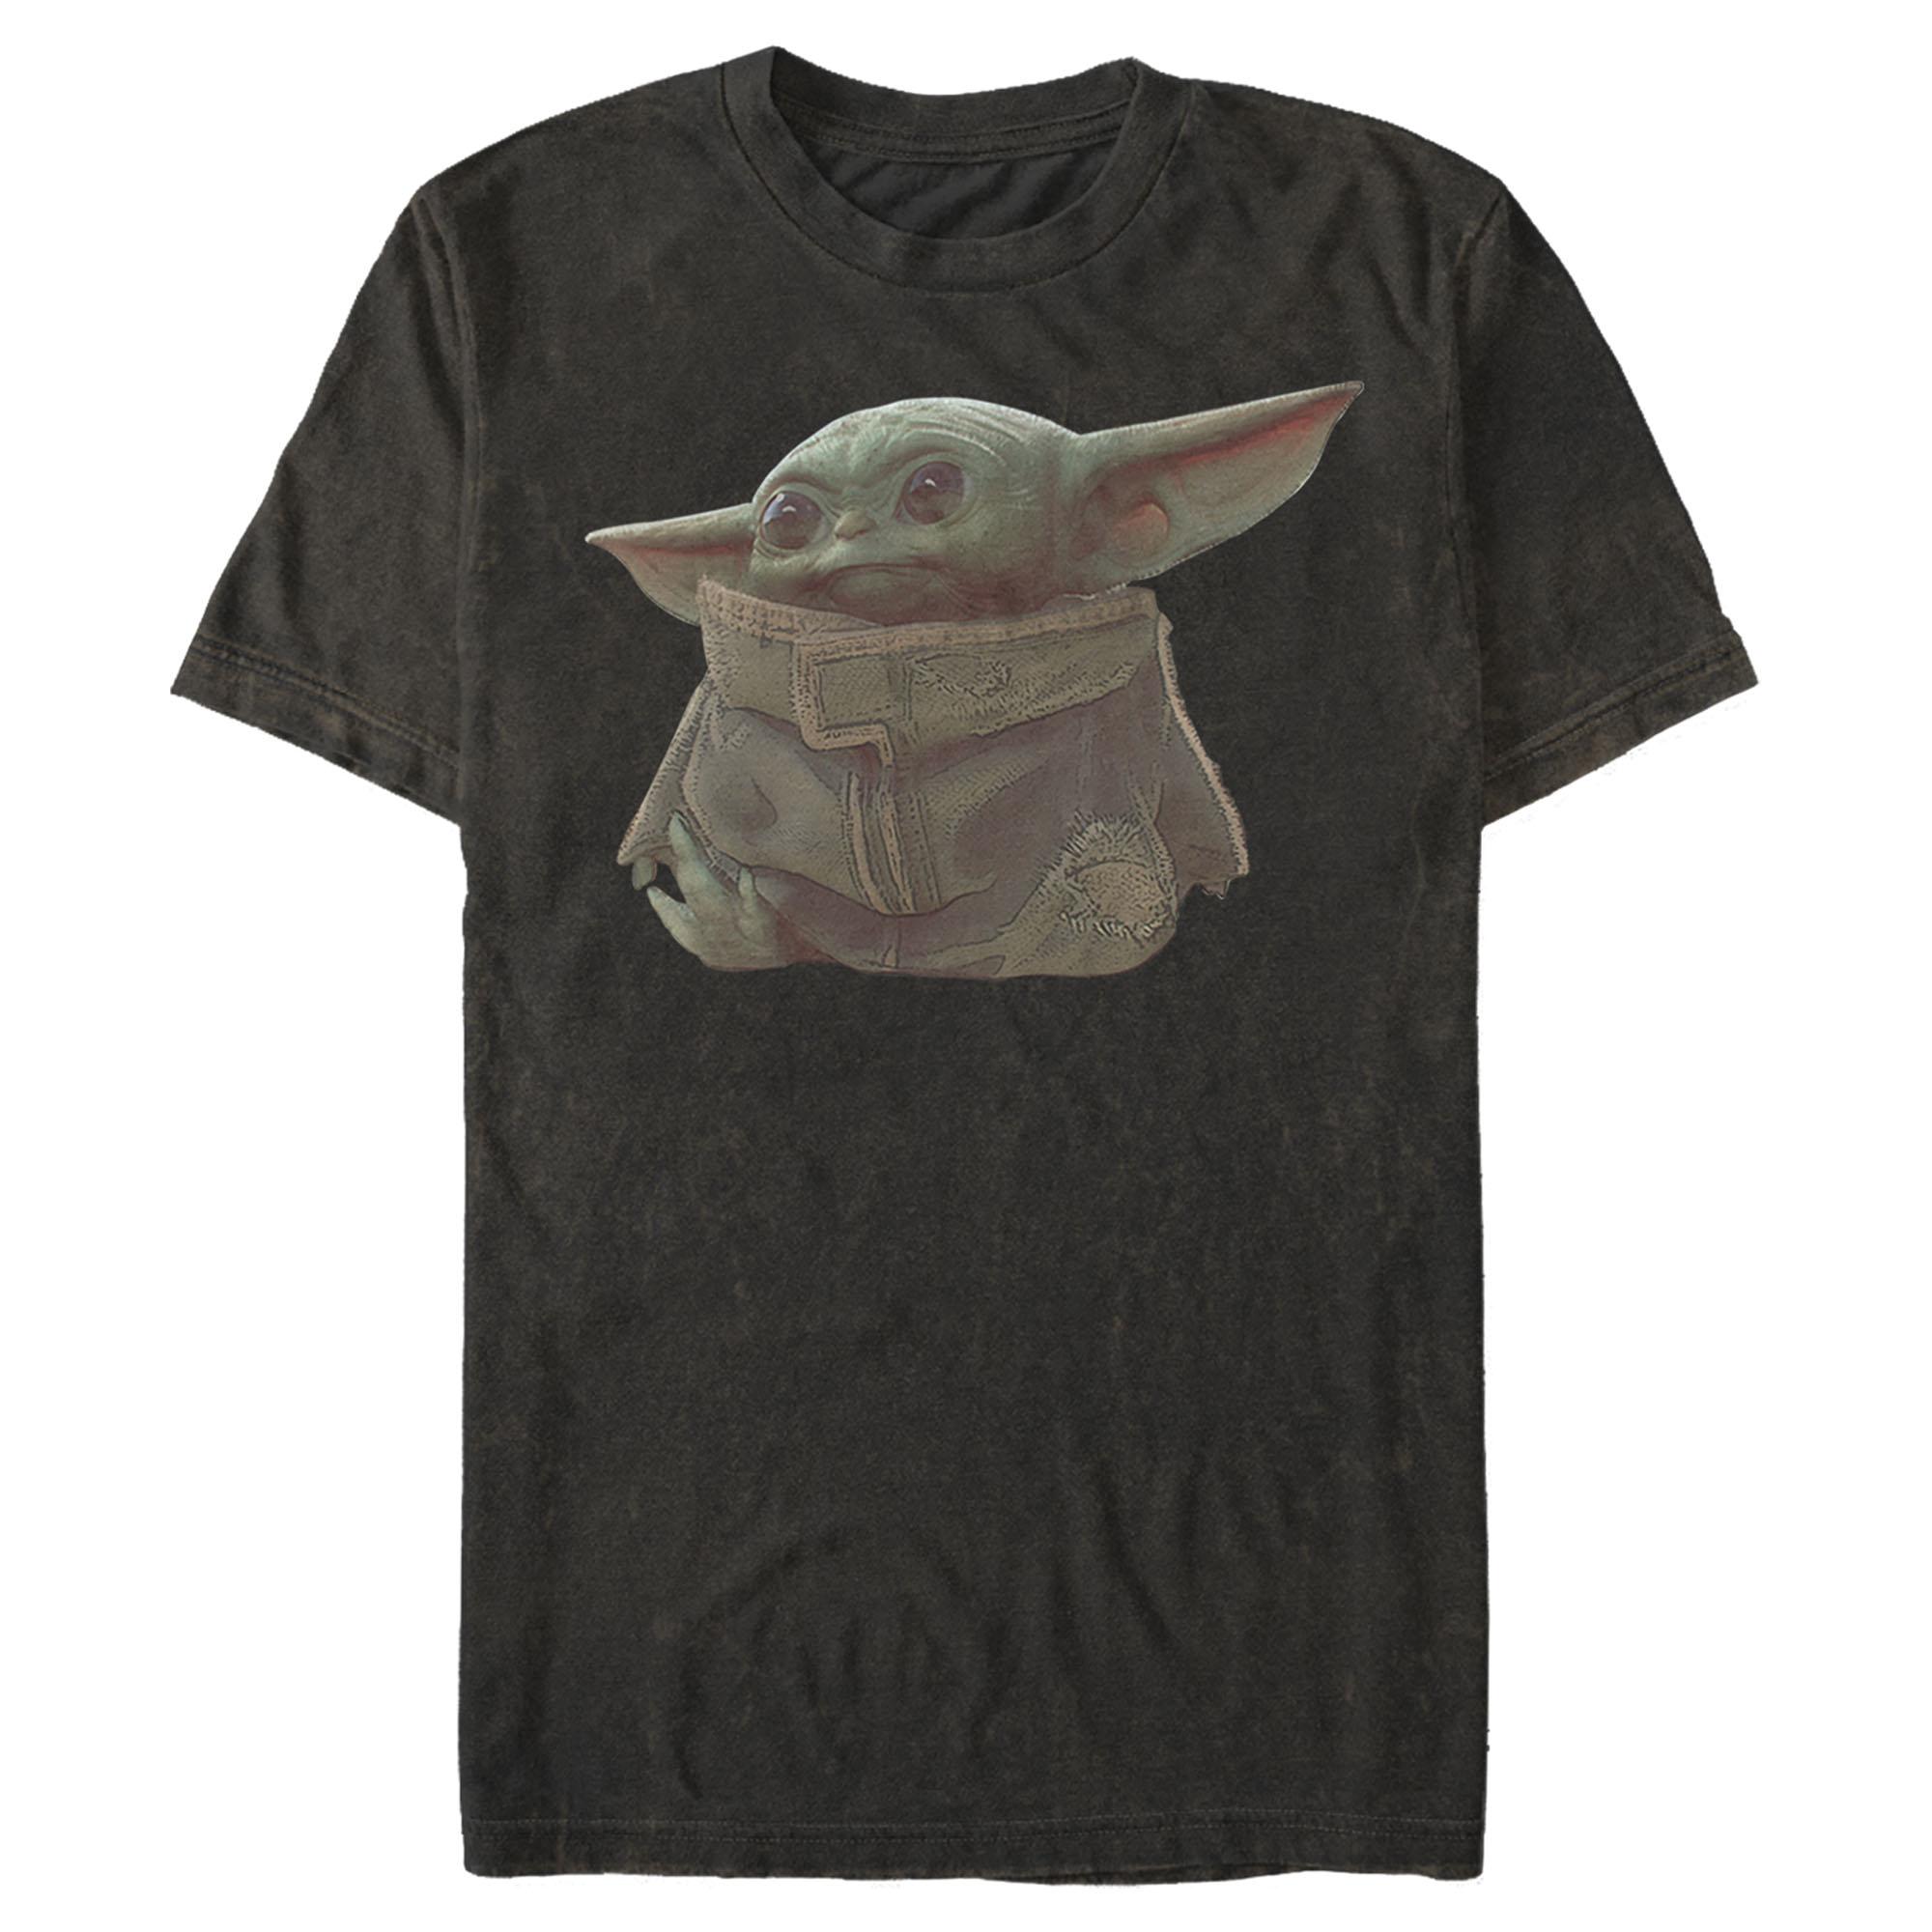 TROS Baby Yoda (The Child) Men's Portrait T-Shirt